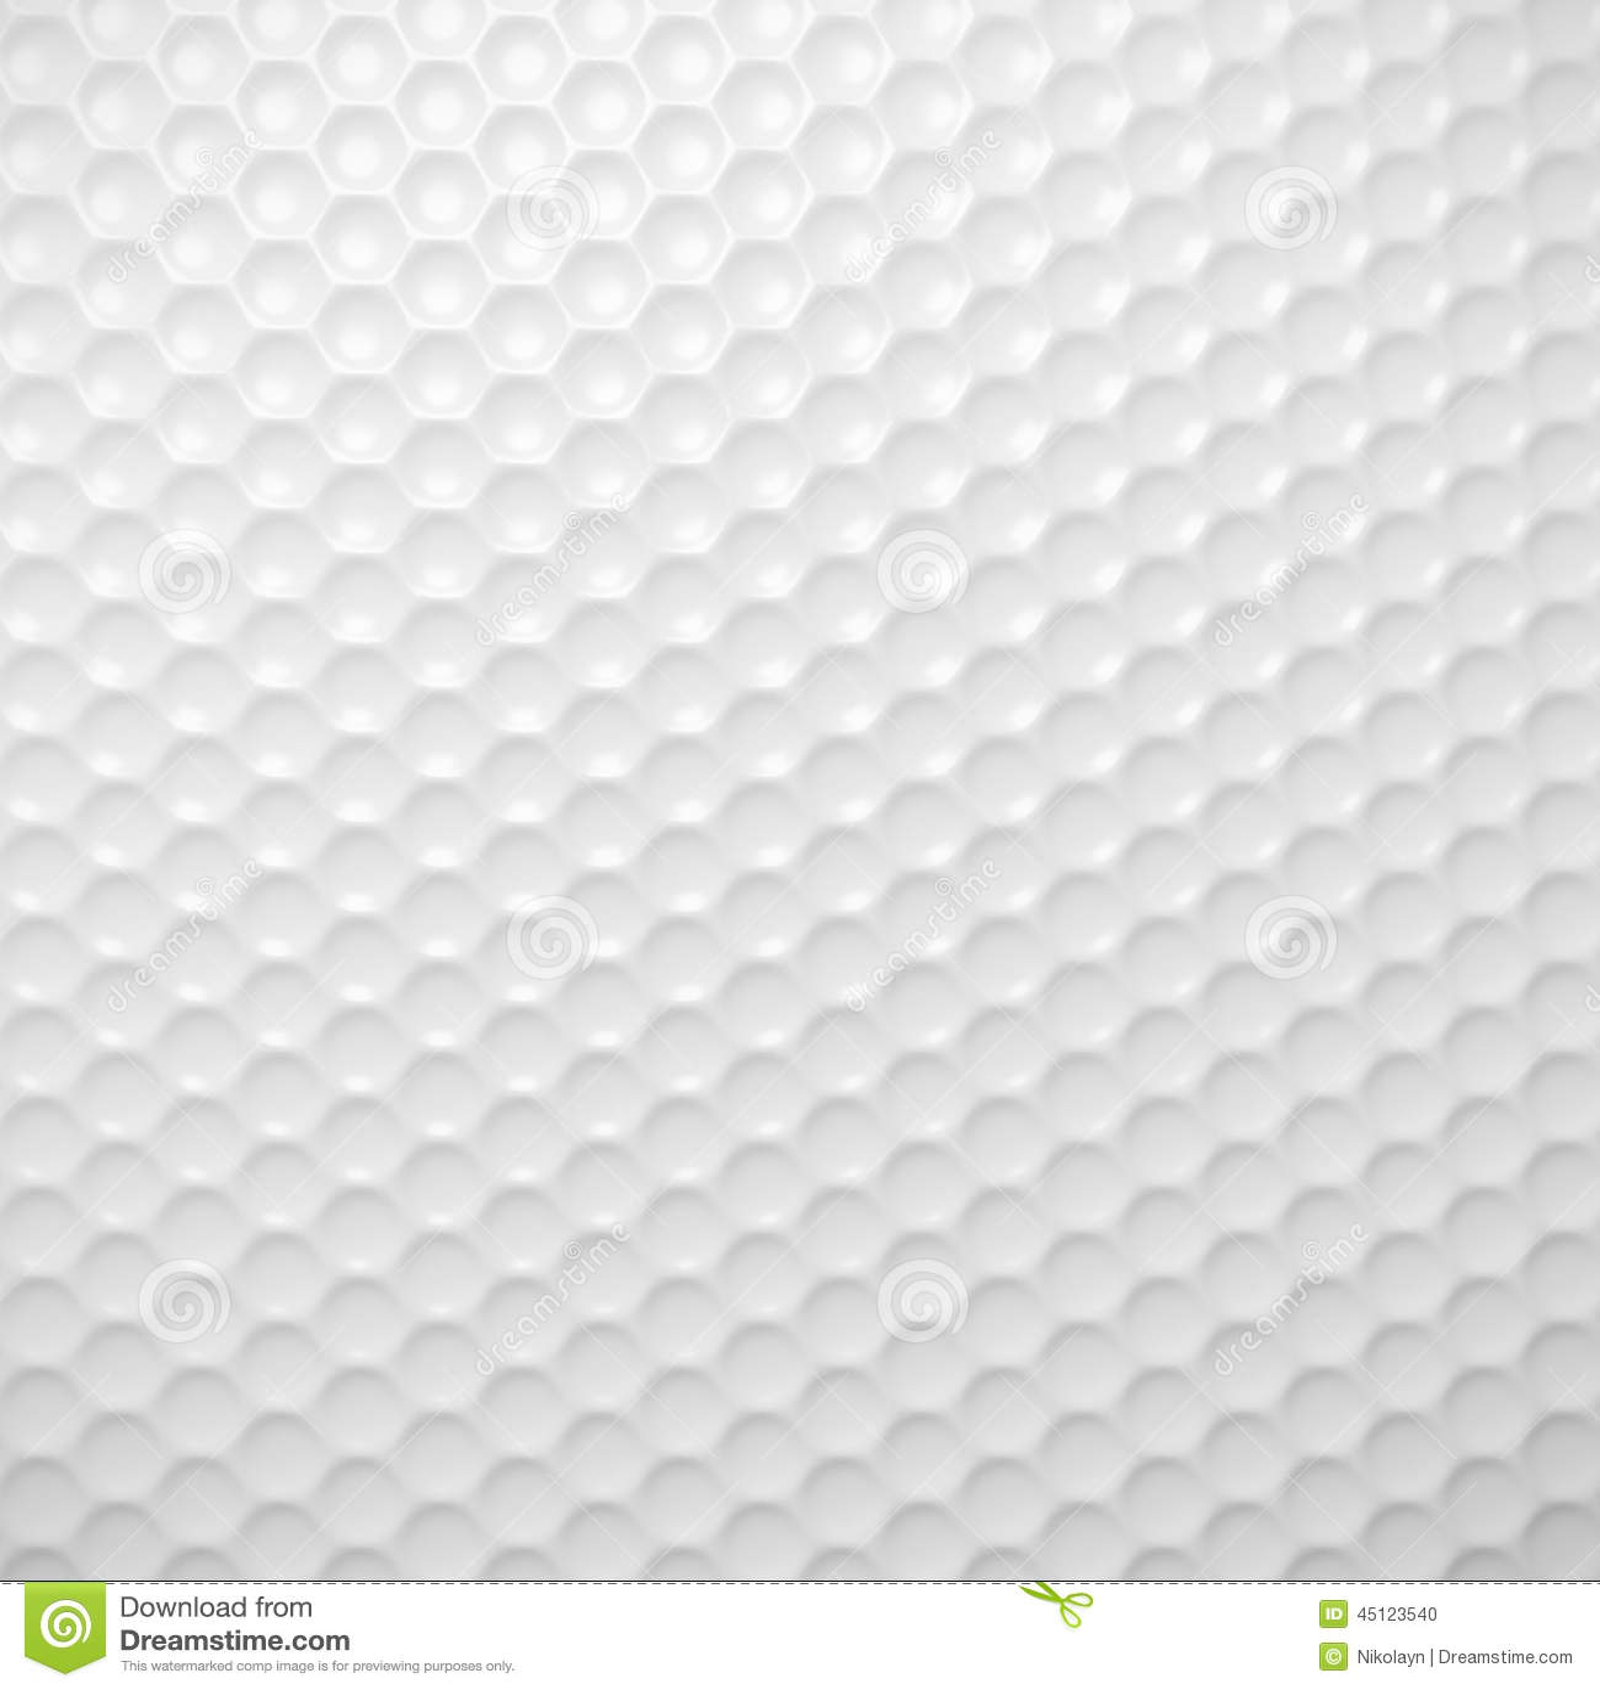 Golf Ball Wallpaper Background Texture Stock Illustration - Image ... Golf Ball On Tee Clipart